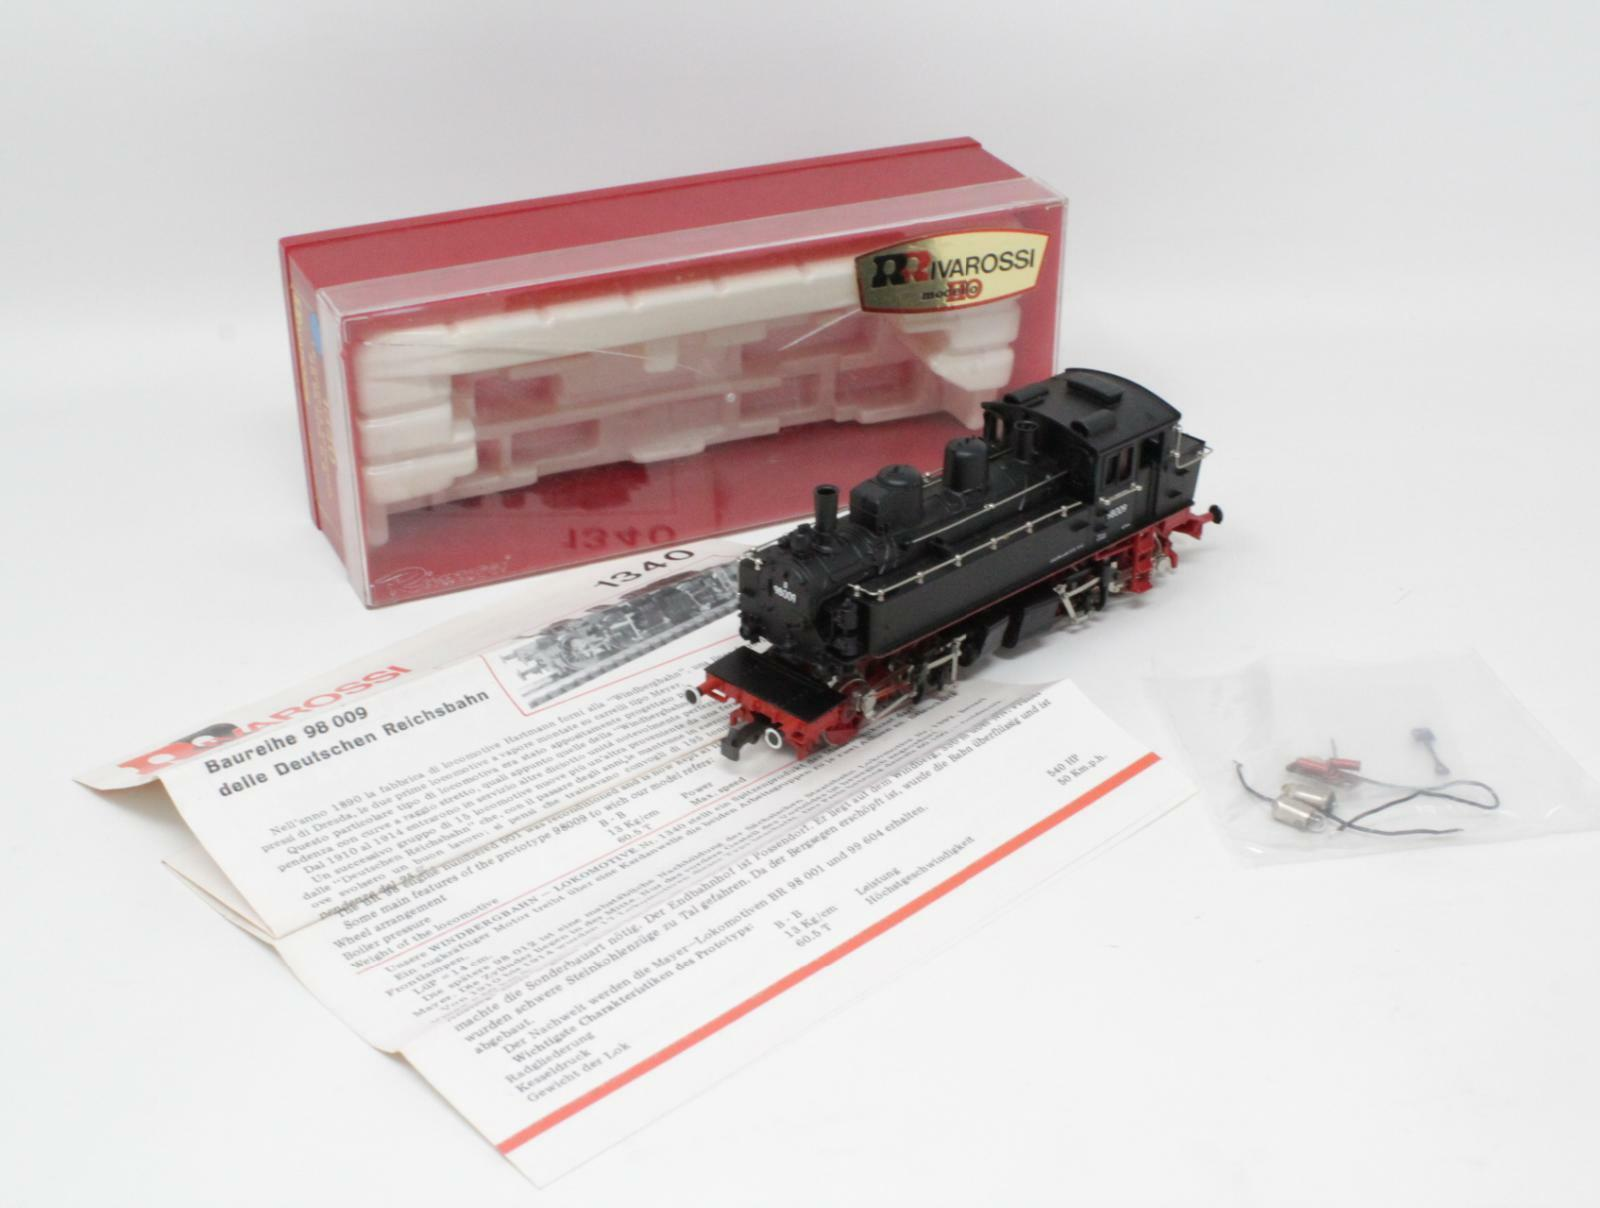 Rivarossi h0 1340 Steam Locomotive complex br98009 0-4-4-0 Dr [mb3-016]